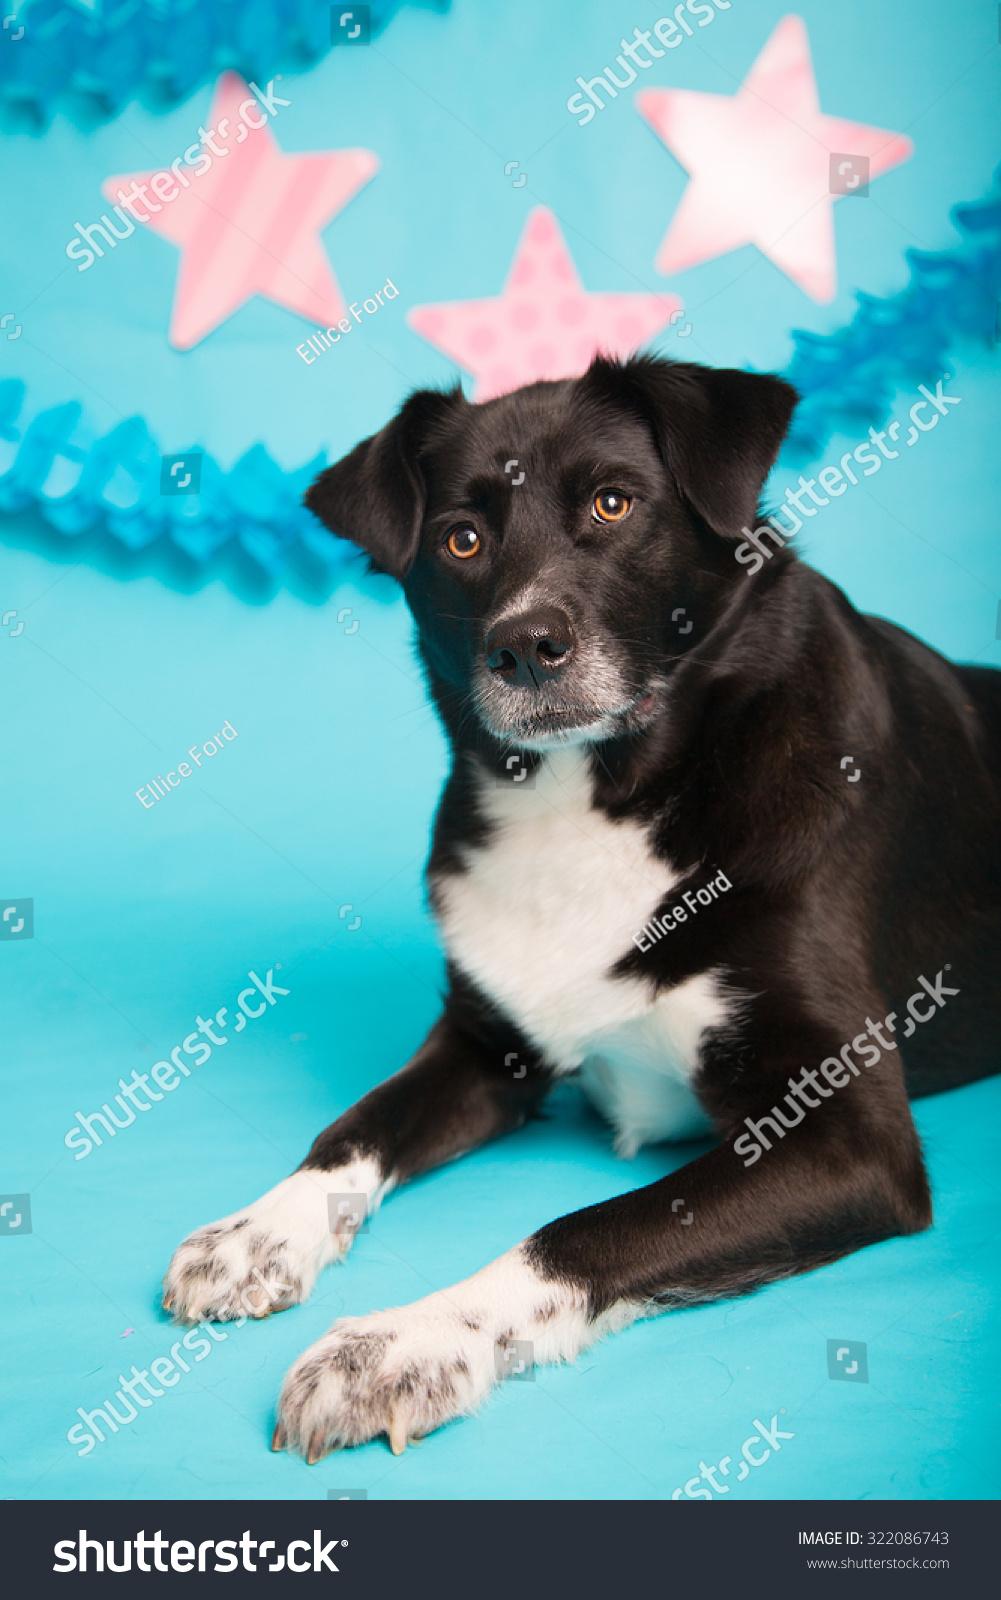 Black Labrador Retrieverhusky Mix Dog Stock Photo (Edit Now ...